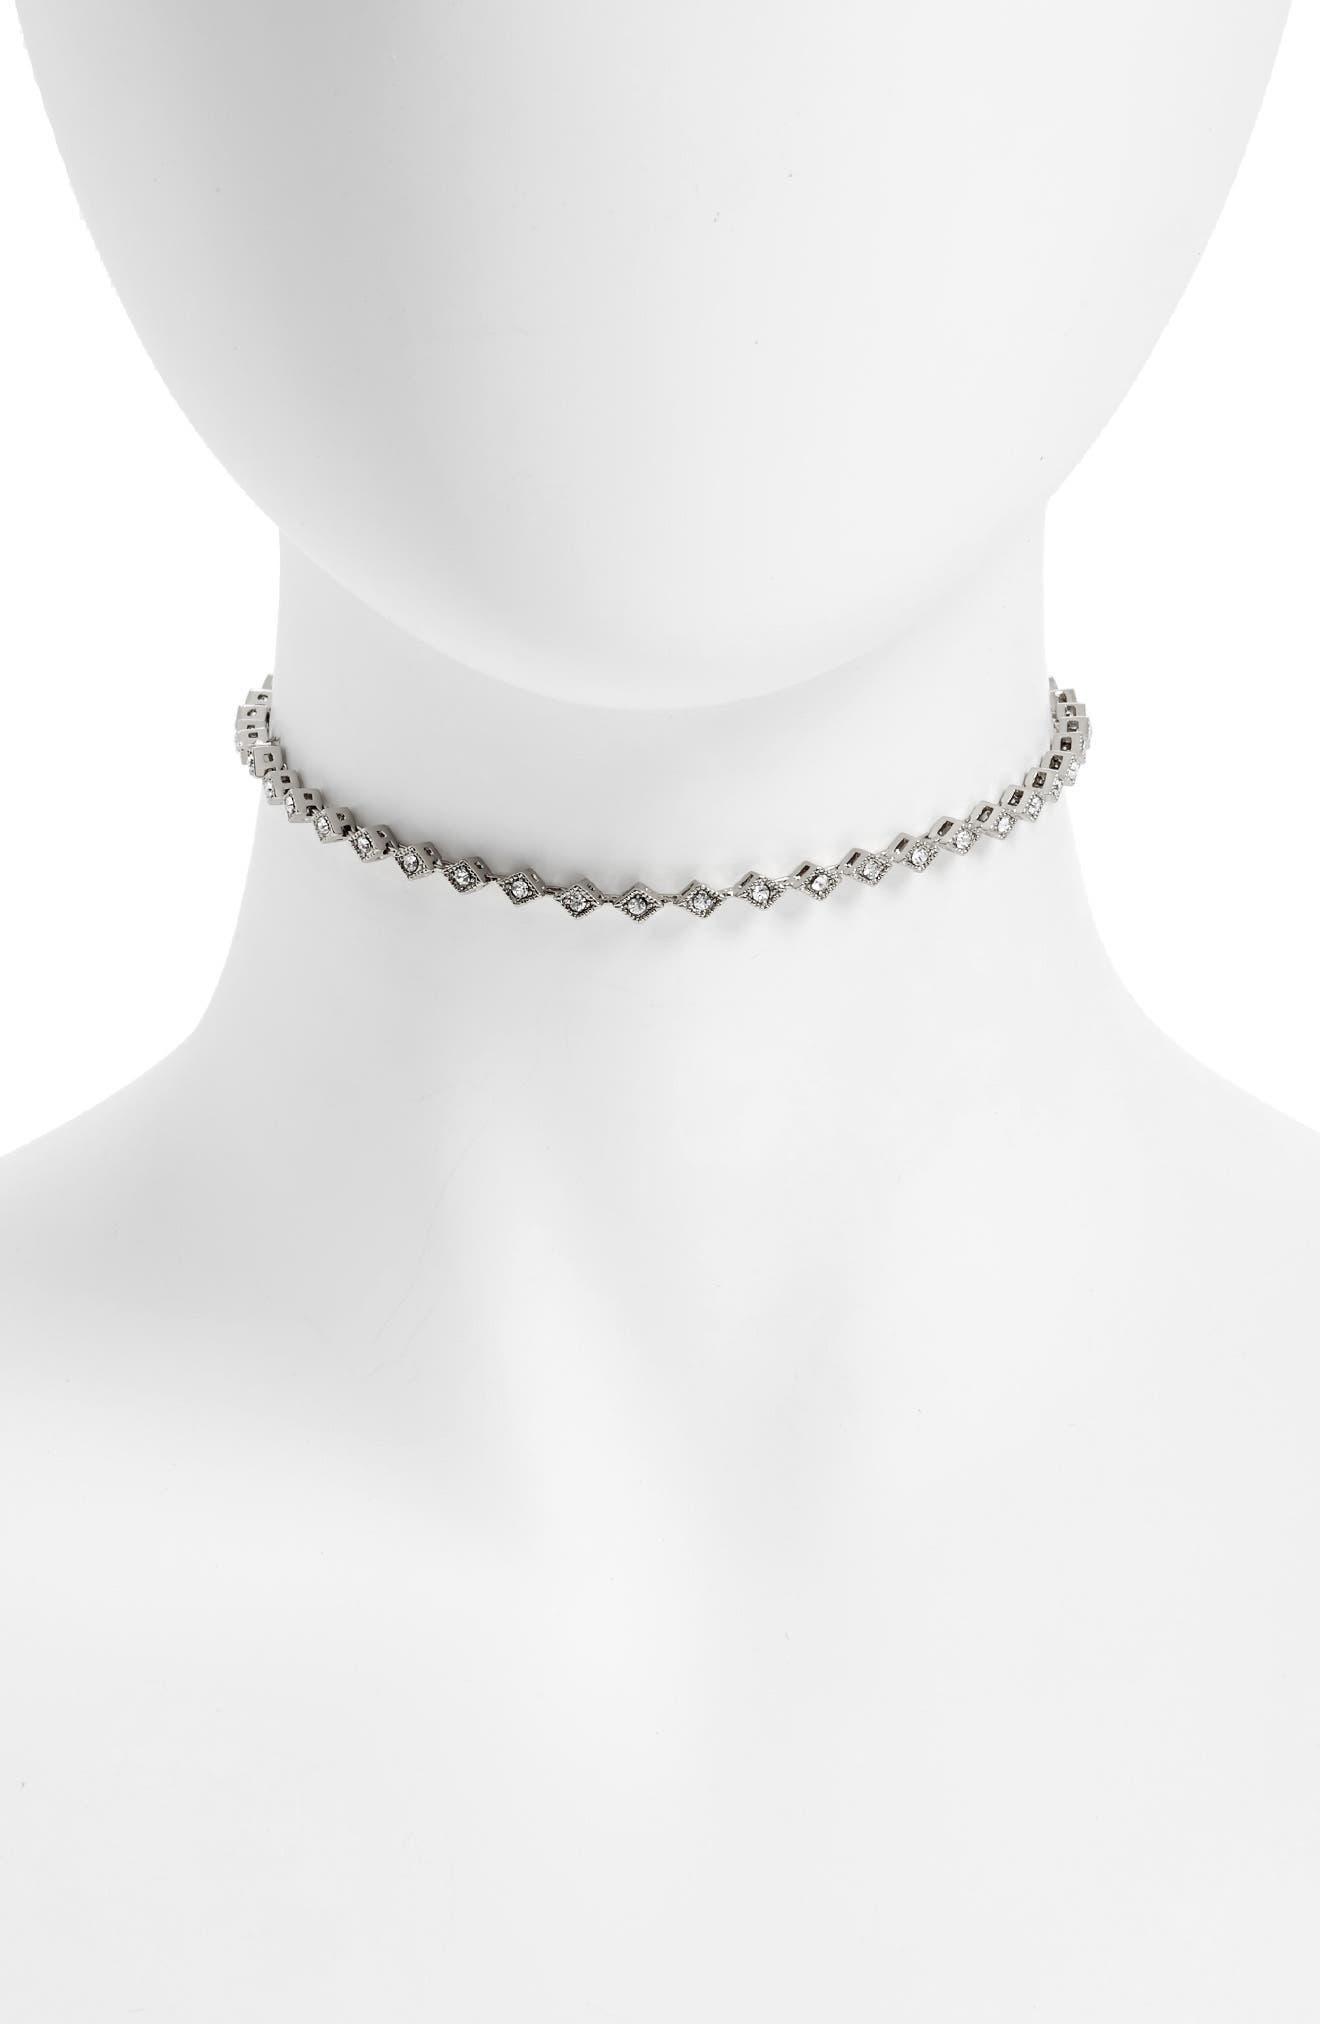 Crystal Cubic Zirconia Choker Necklace,                             Main thumbnail 1, color,                             040